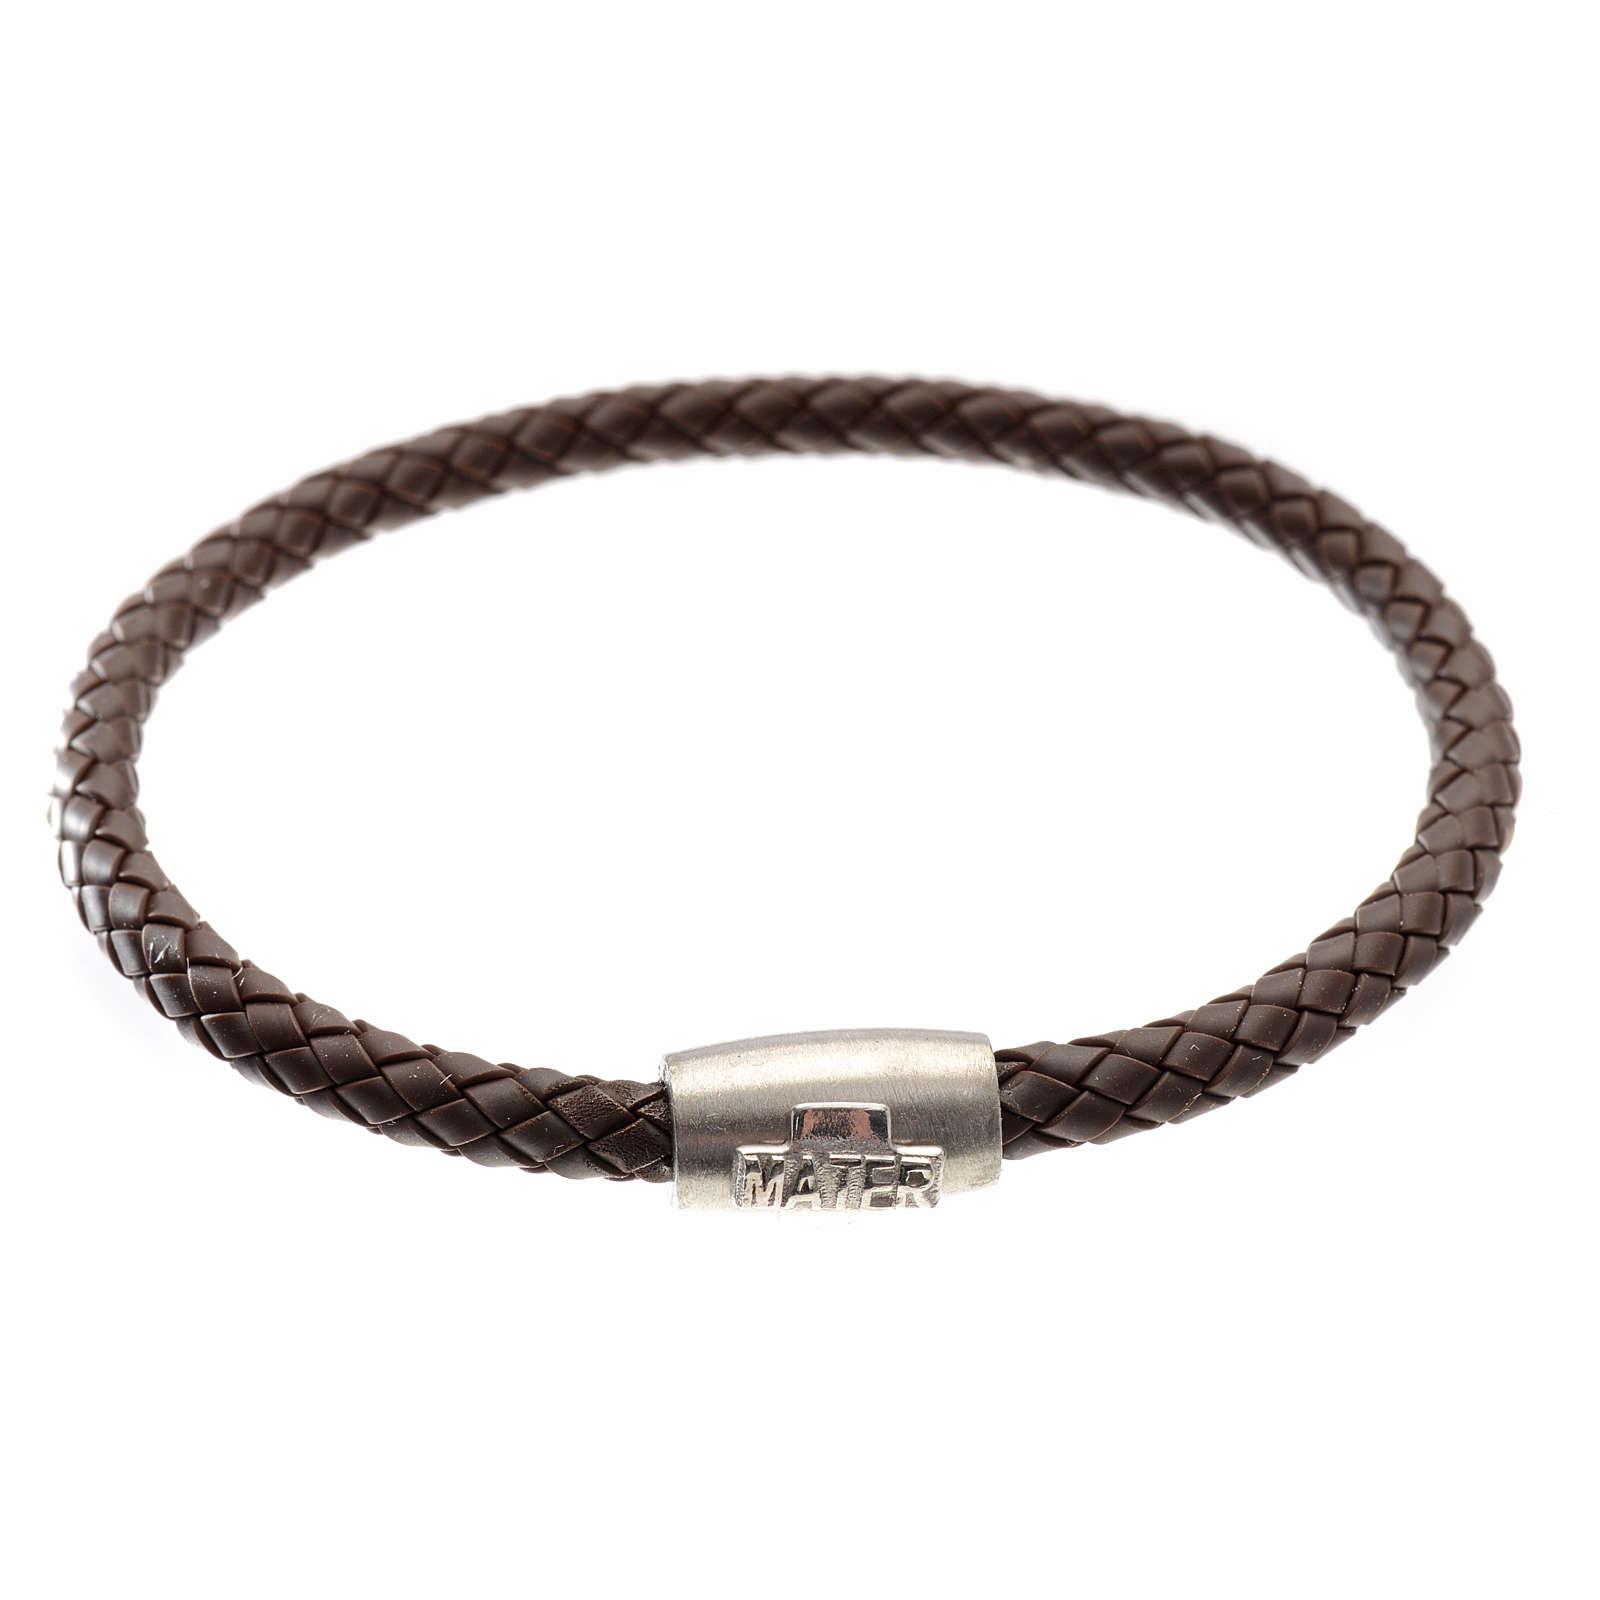 Armband MATER braun mit Kreuz aus Silber 925 4